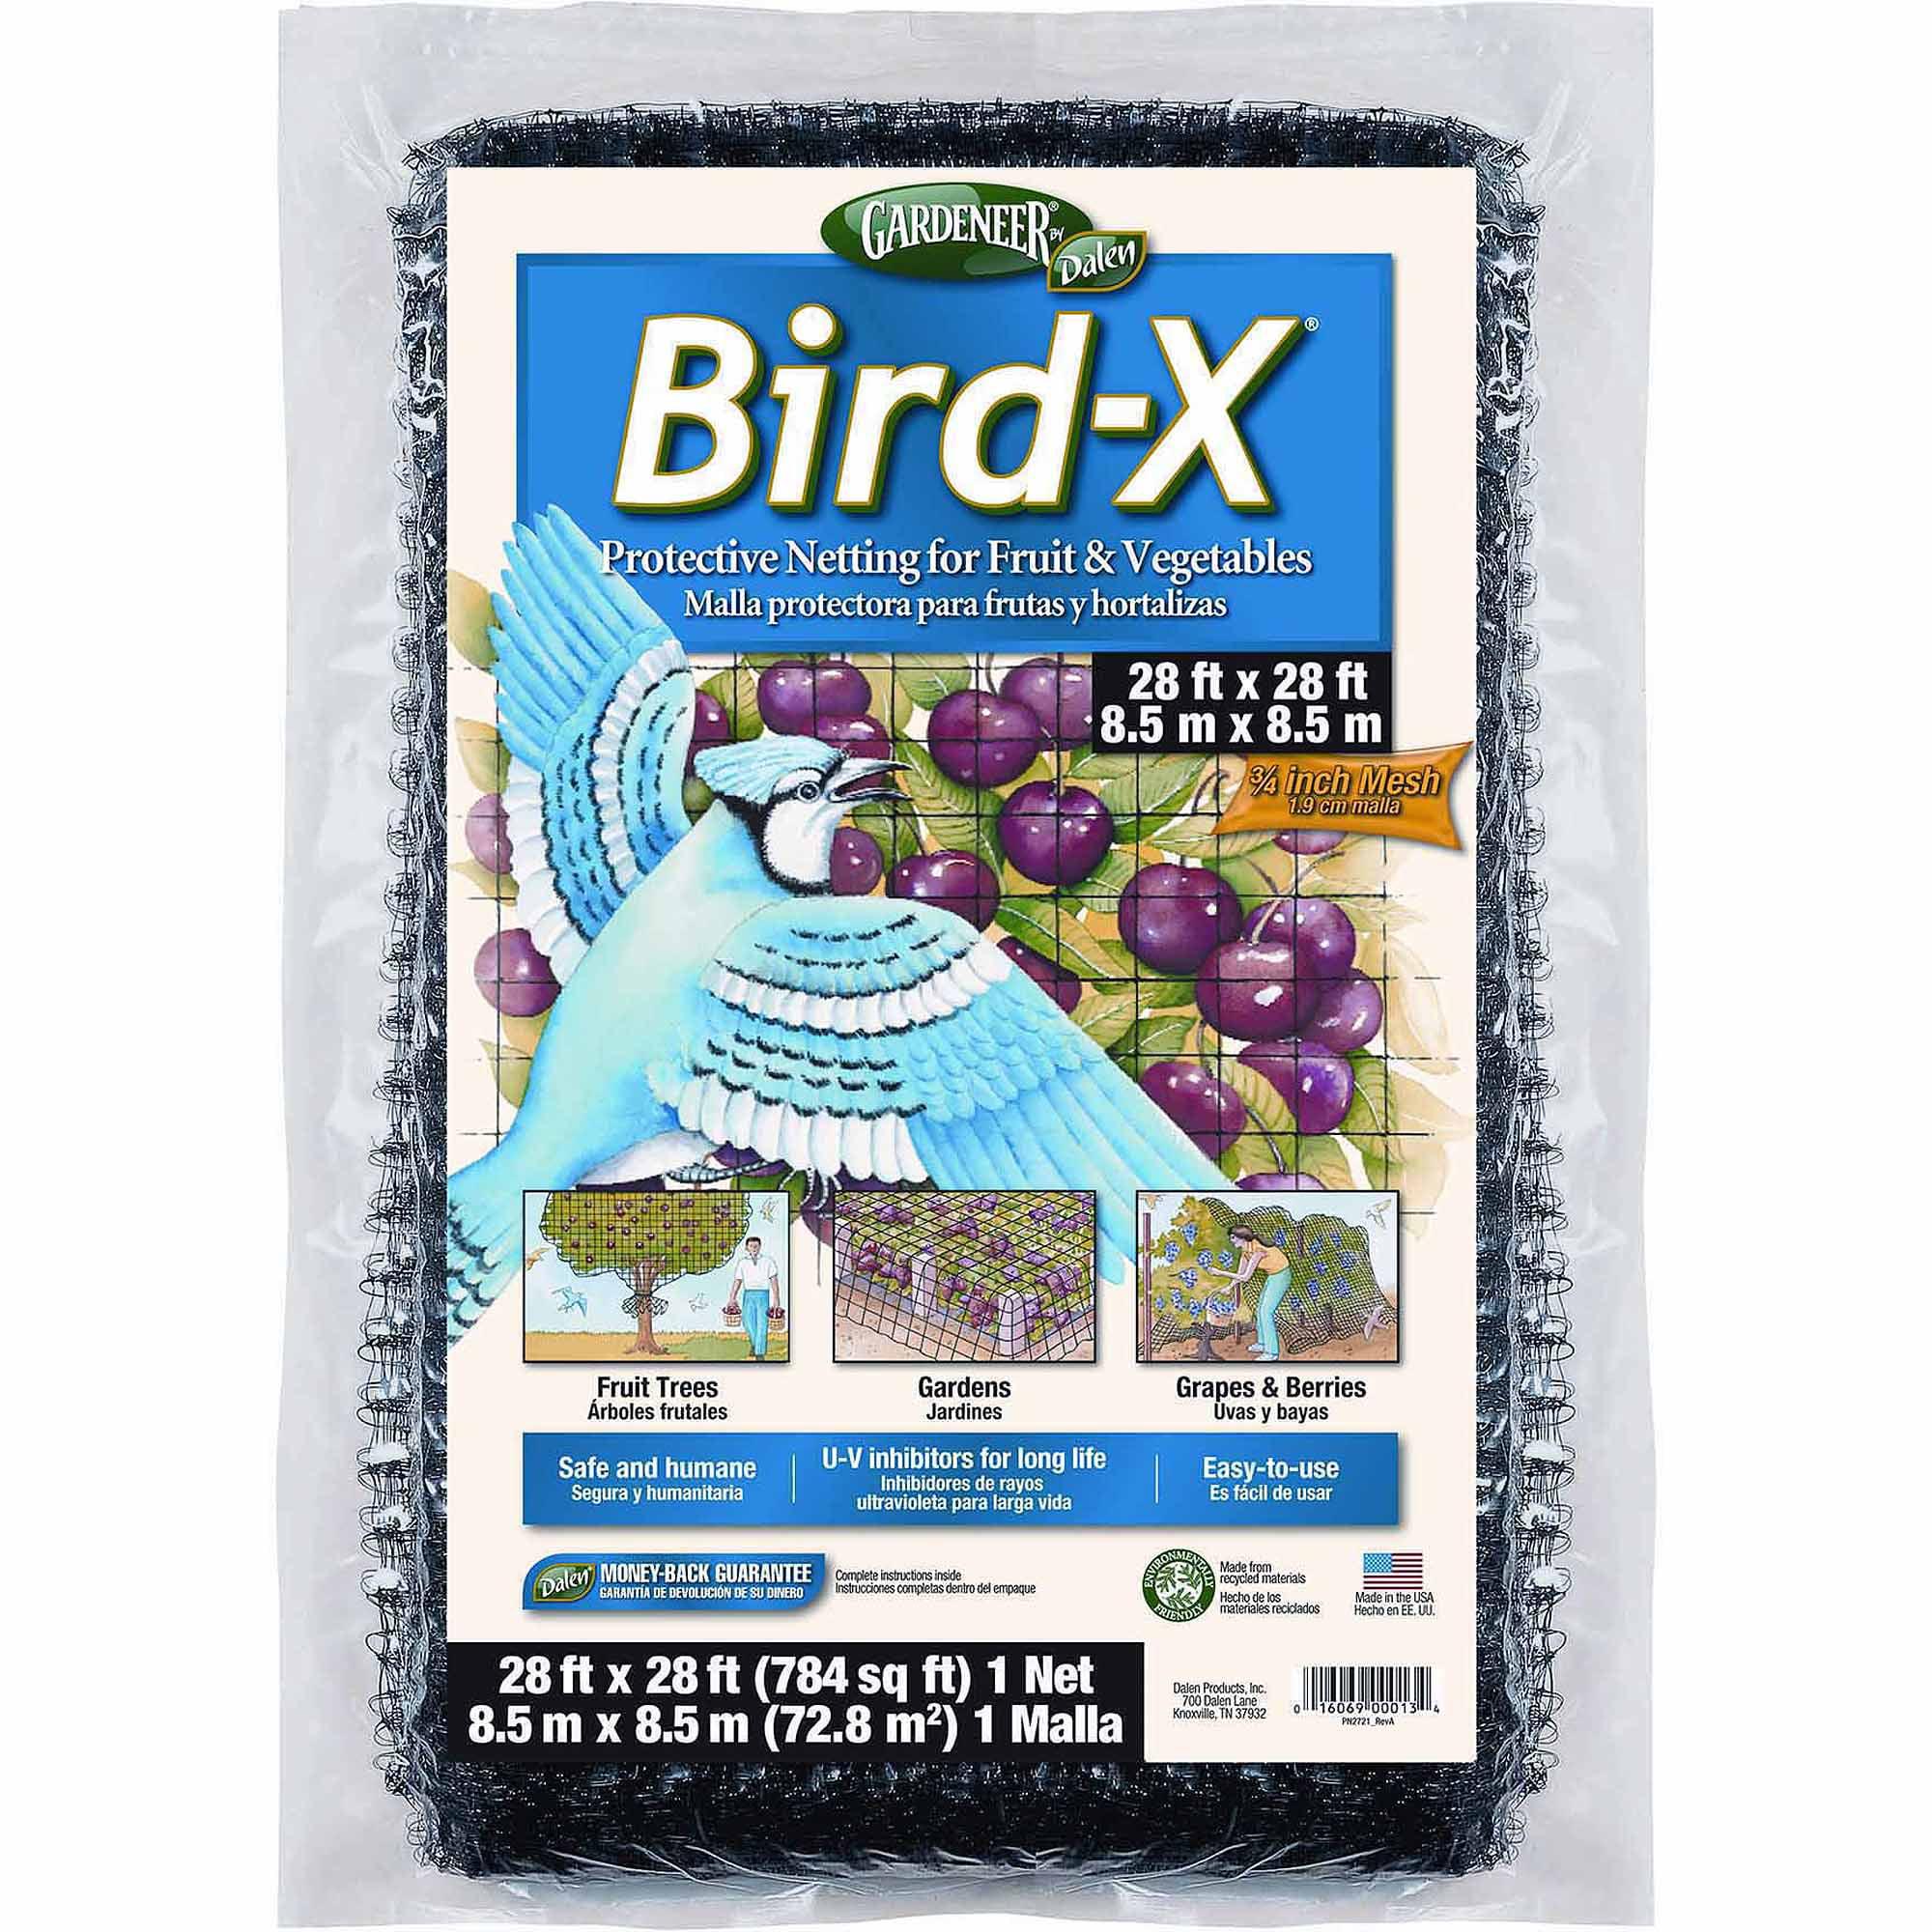 Gardeneer Bird-X Netting, 28ft x 28ft